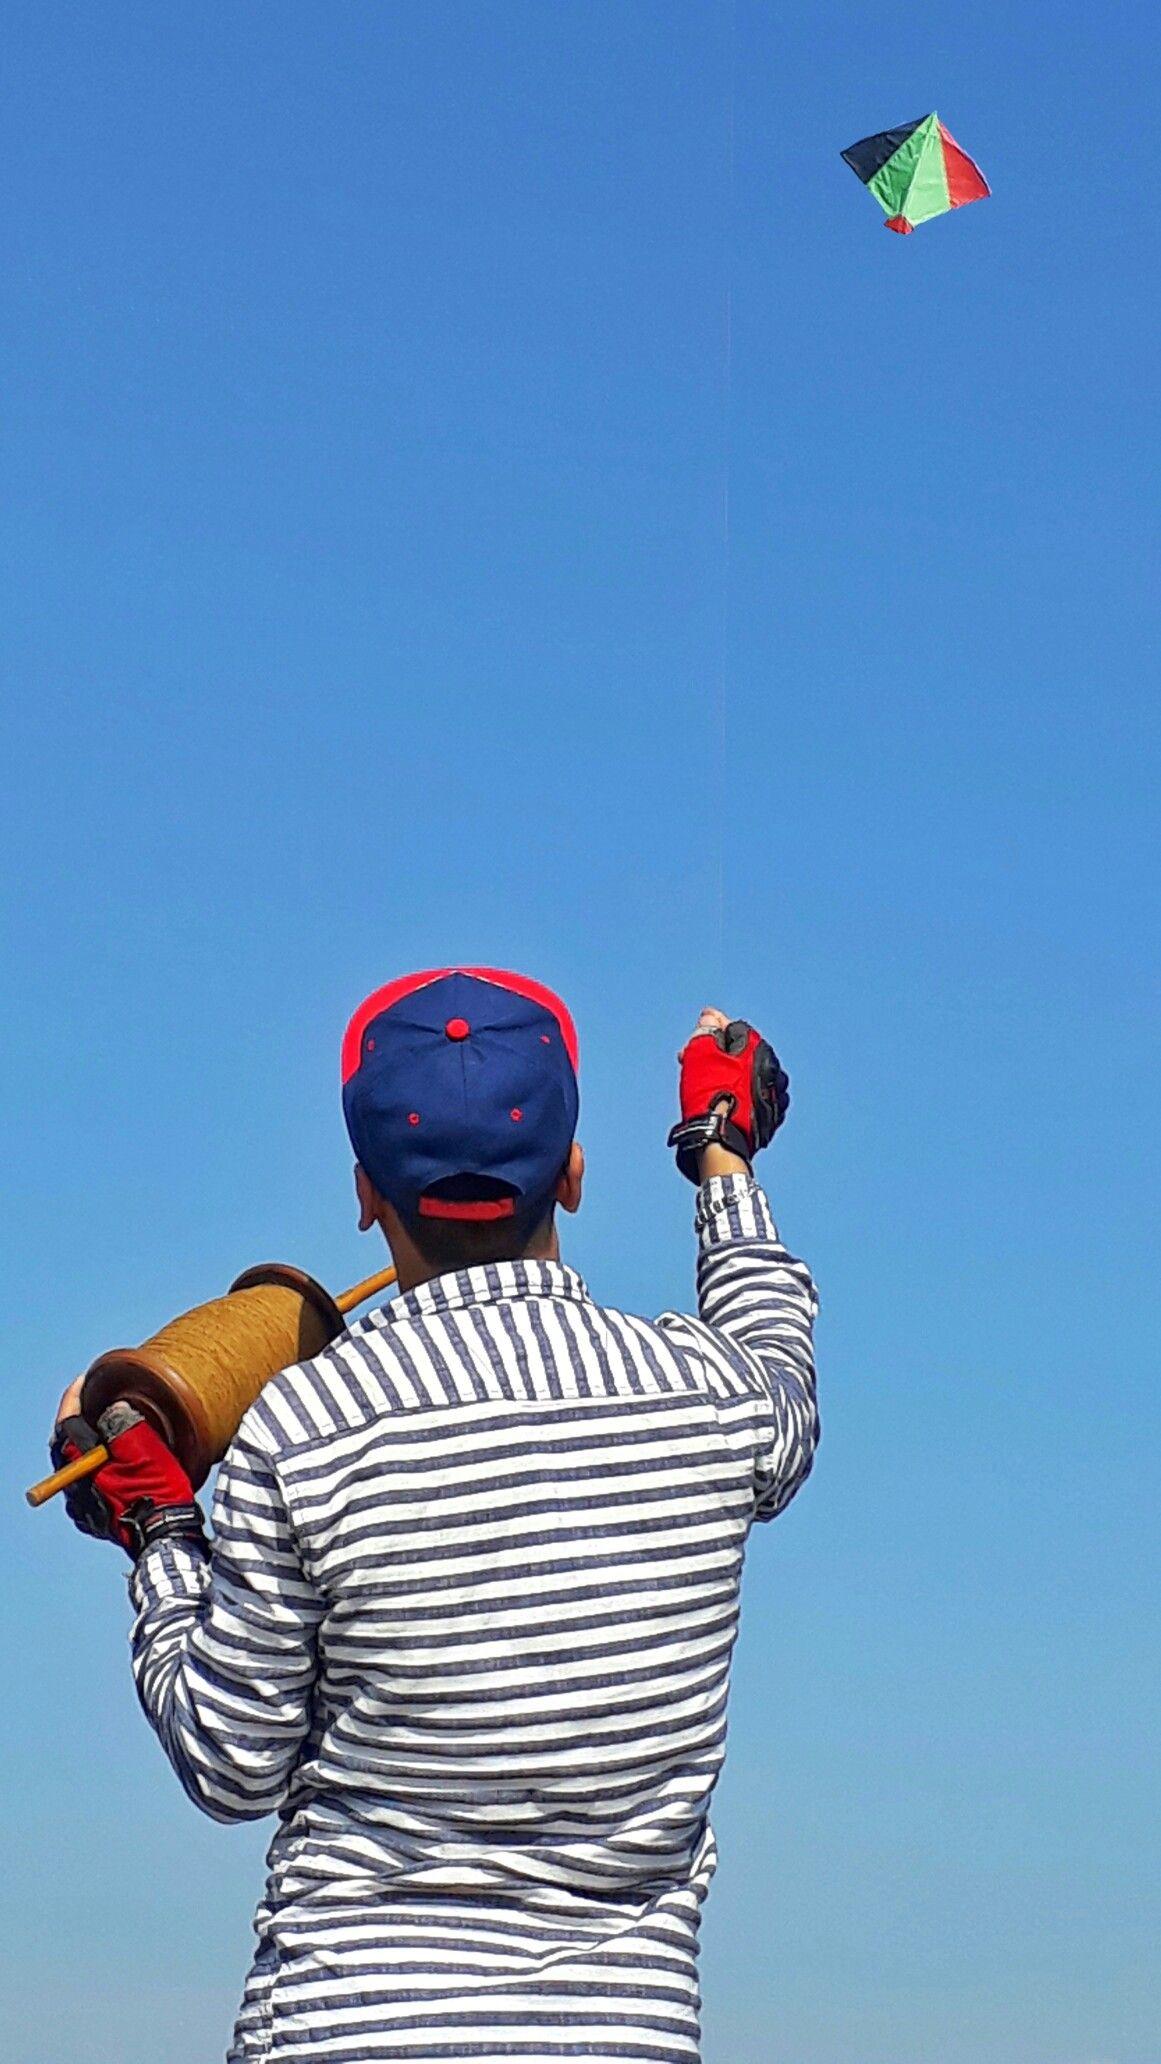 Dashain Vibes, Flying Kites Kite, Kite flying, Nepal